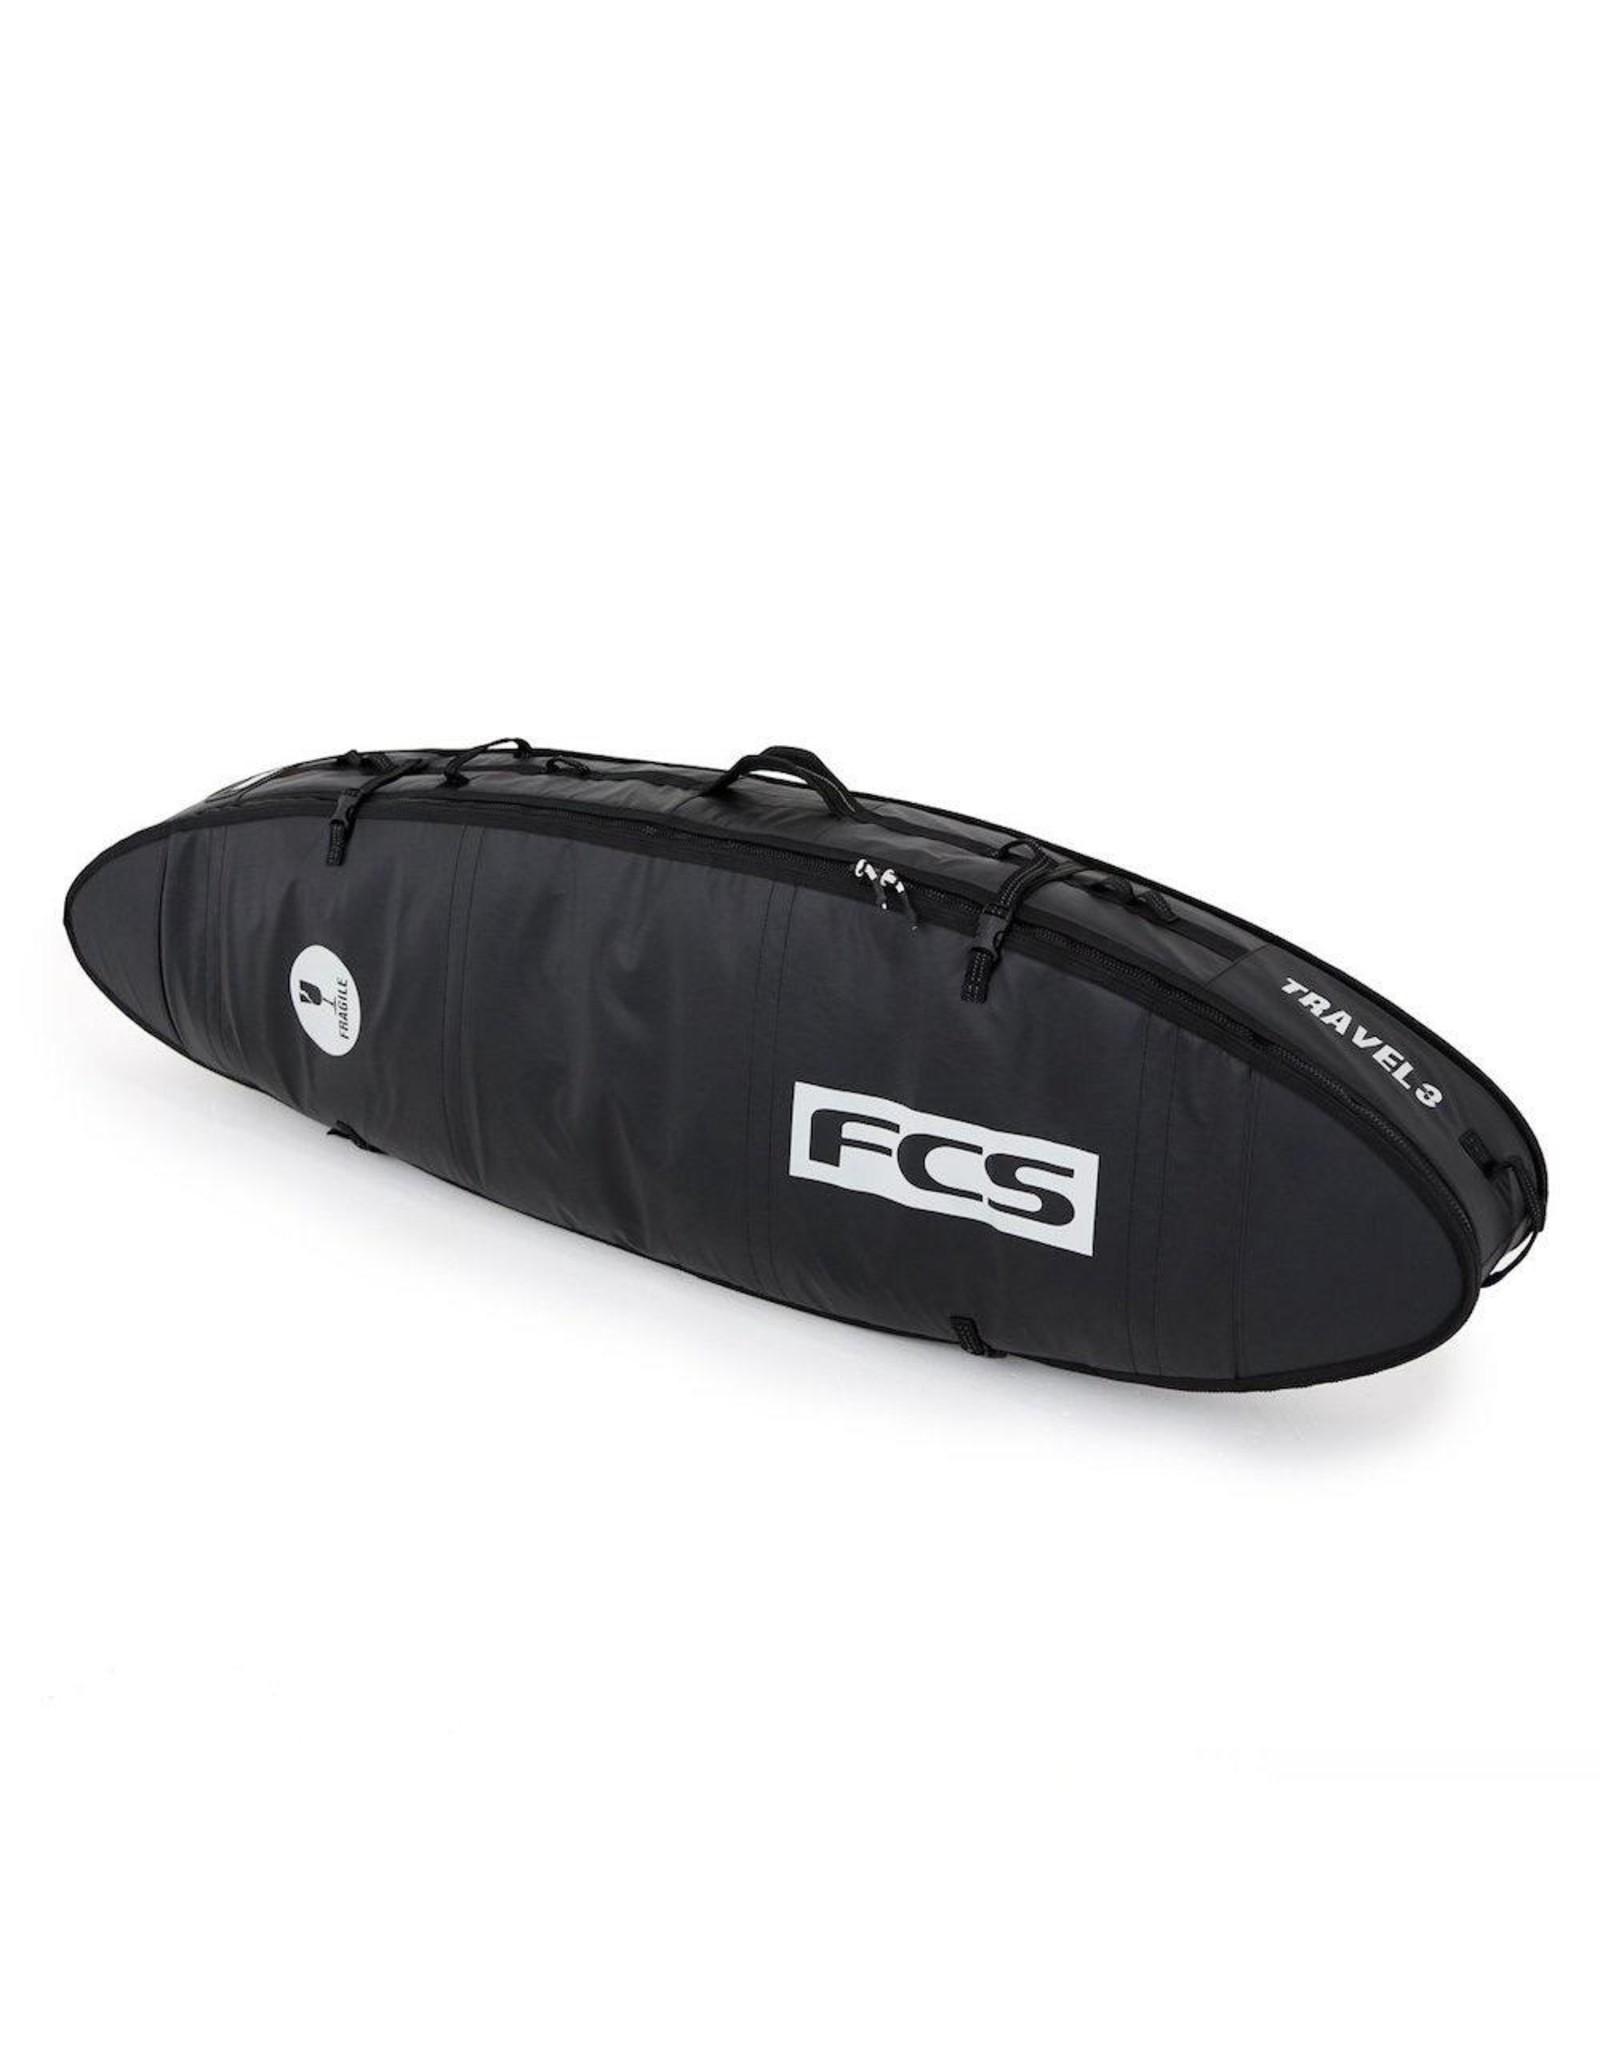 FCS FCS - Travel 3 All Purpose - 6'7 - Black/Grey - Boardbag